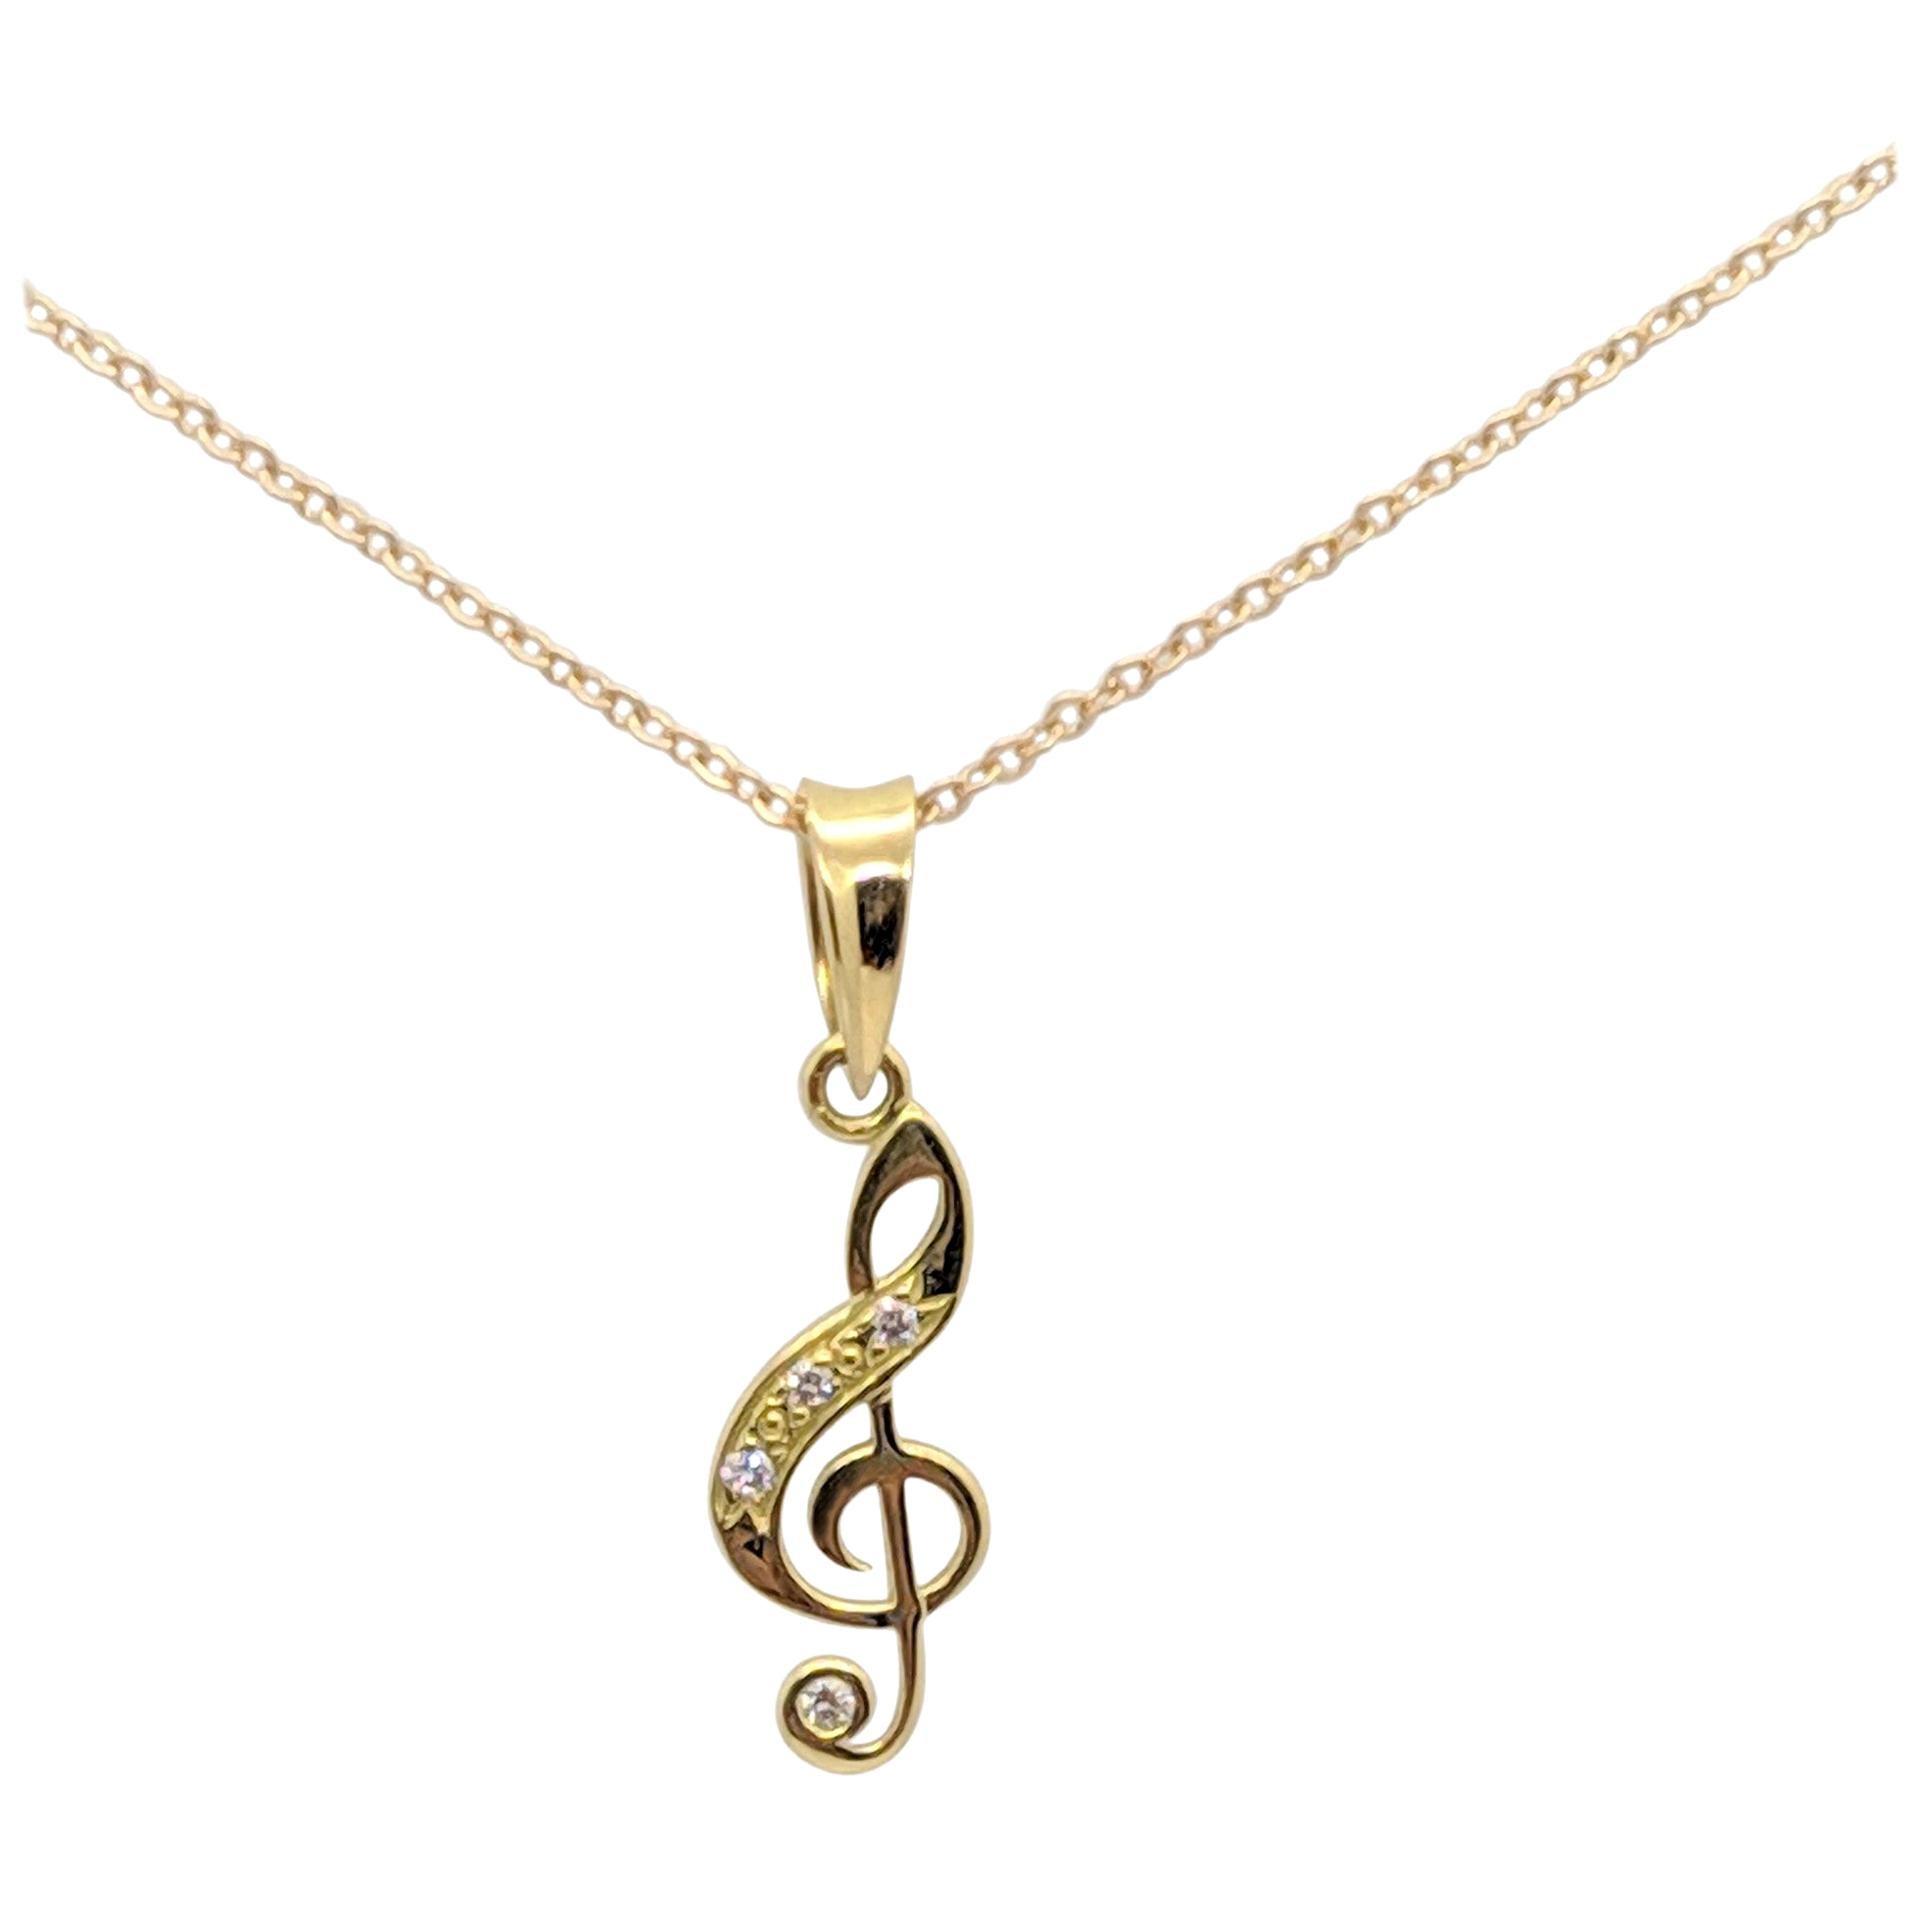 Kian Design 18 Carat Yellow Gold Sol Key Round Brilliant Cut Diamond Necklace